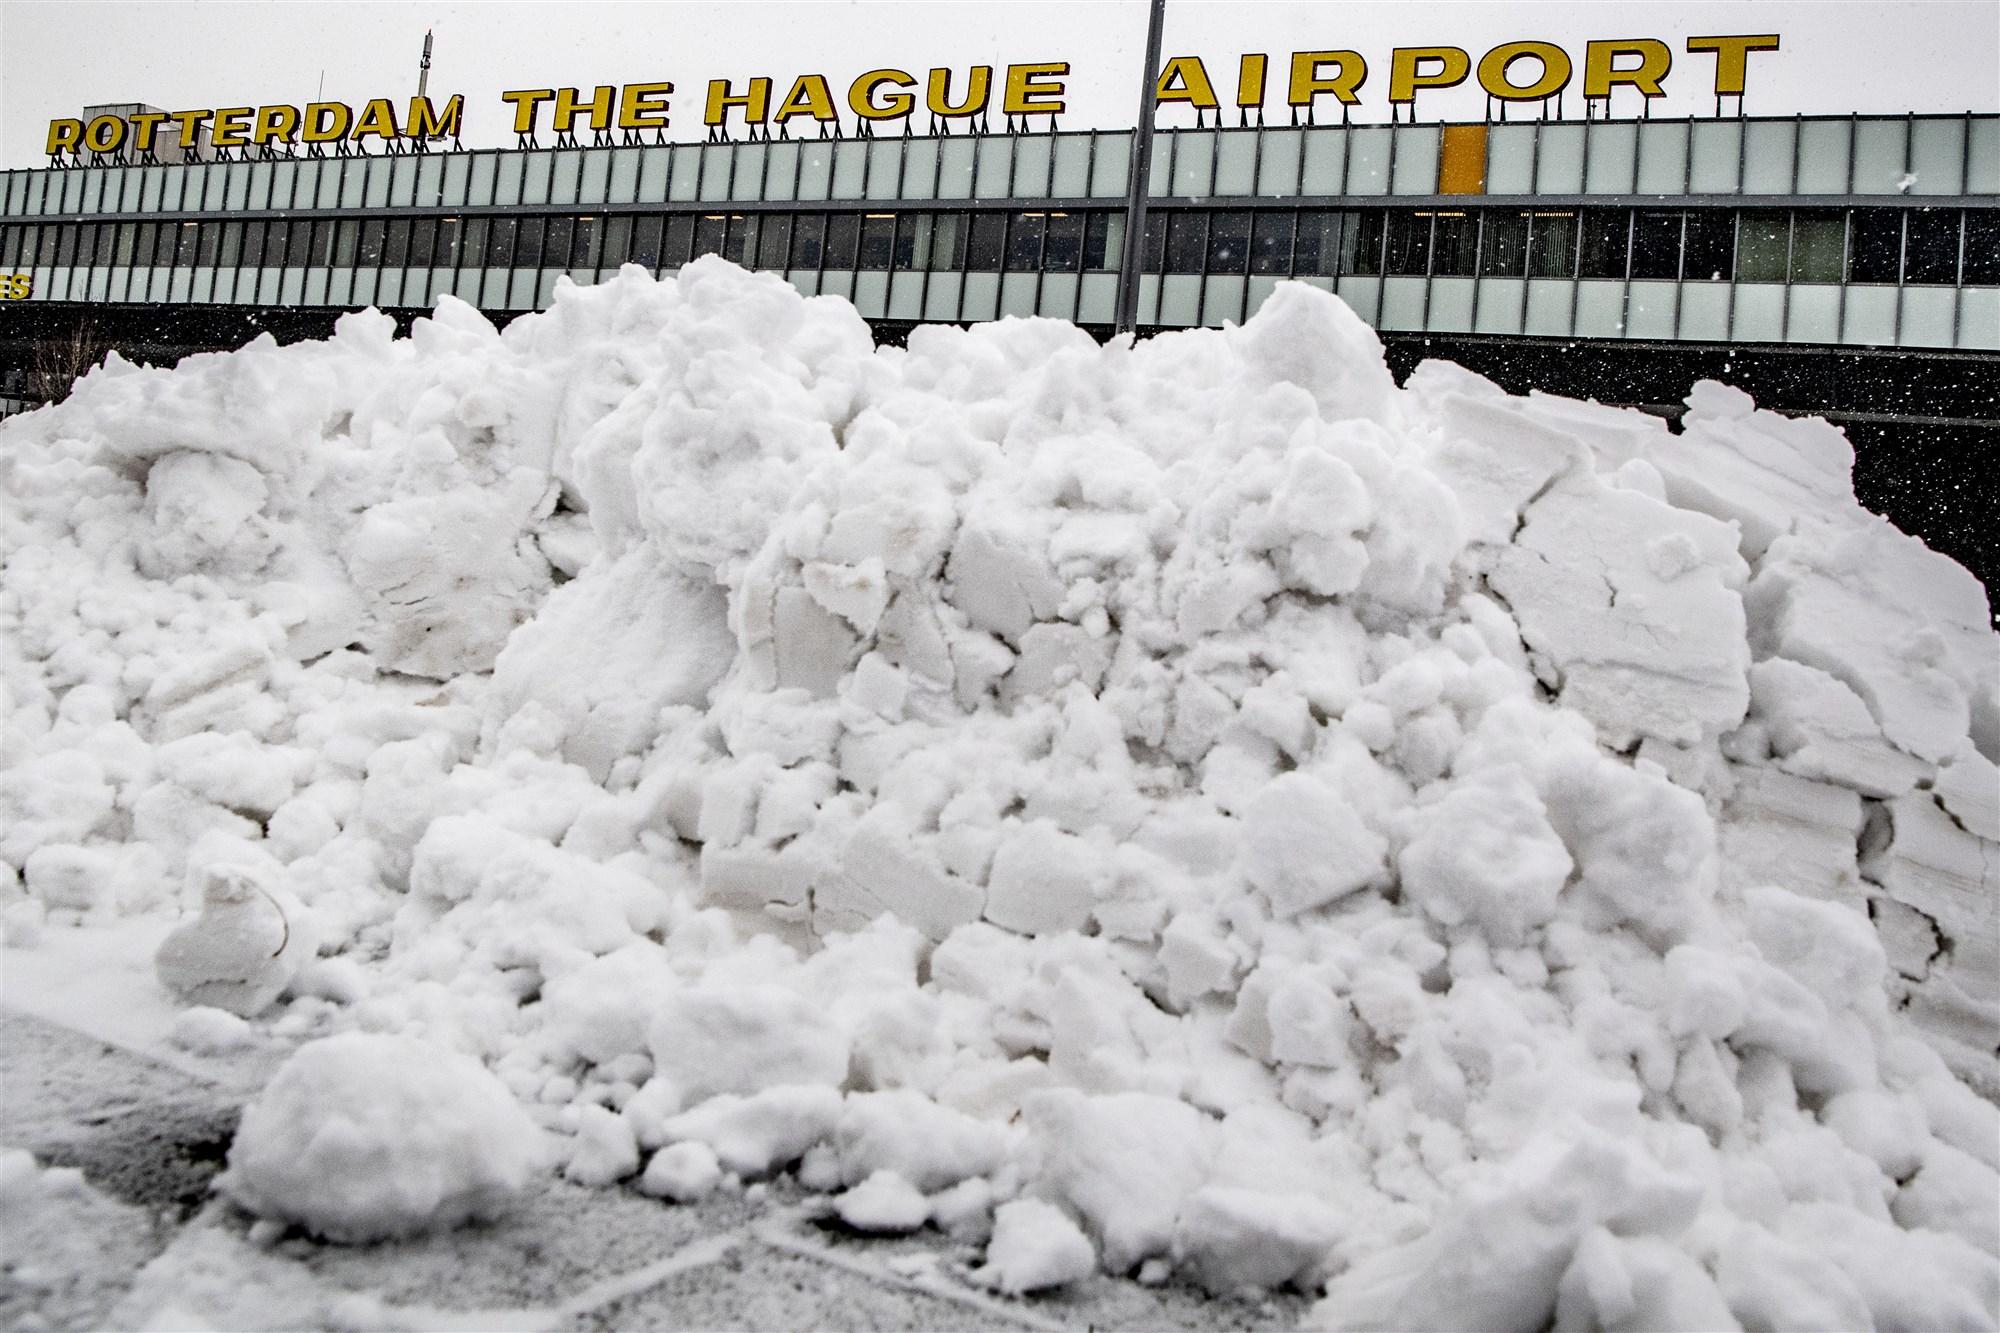 Sneeuw Rotterdam The Hague Airport